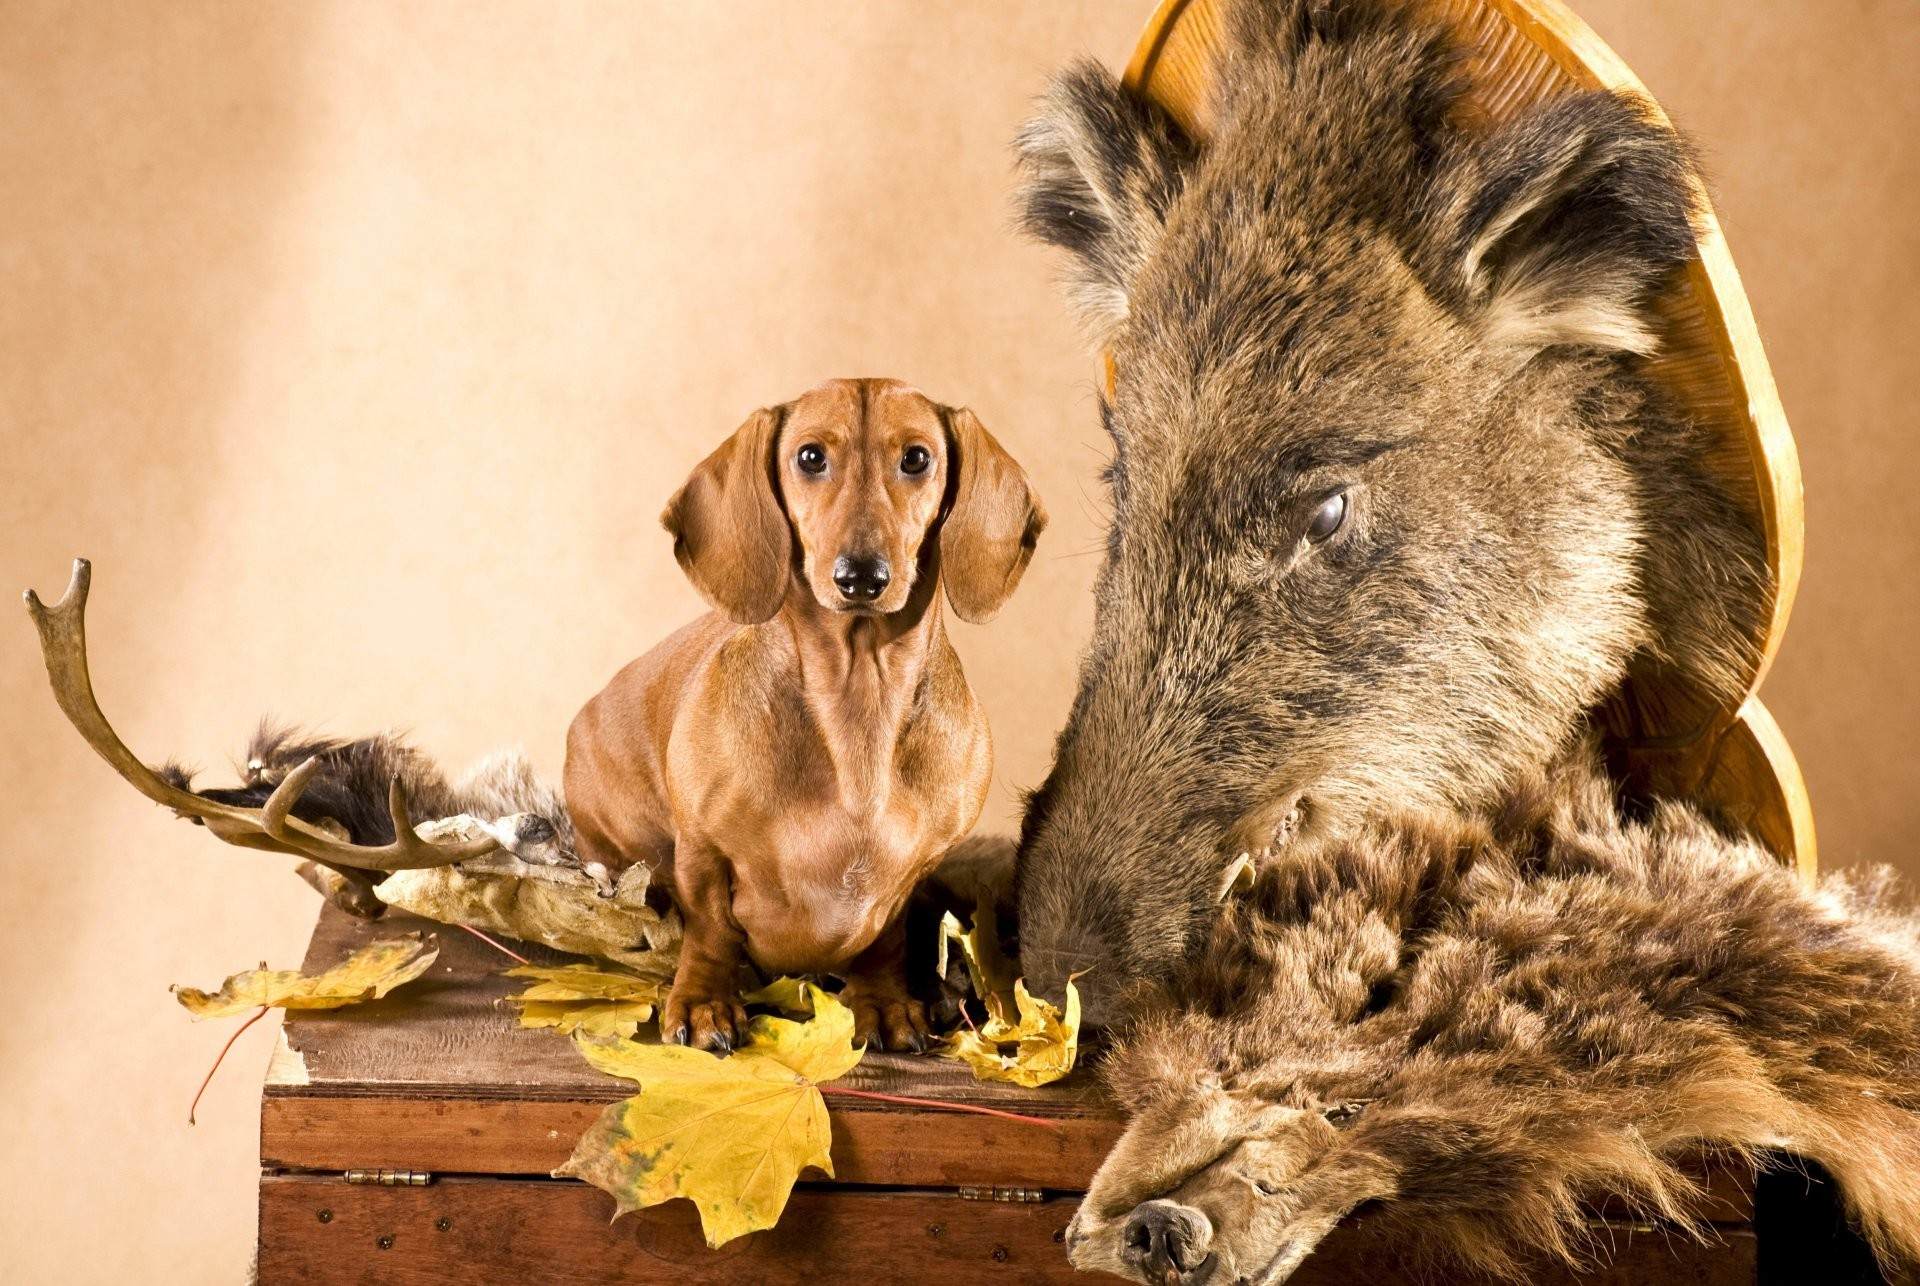 New Free Screensavers Download Free Screensavers · hunting dog screensavers  and wallpapers …